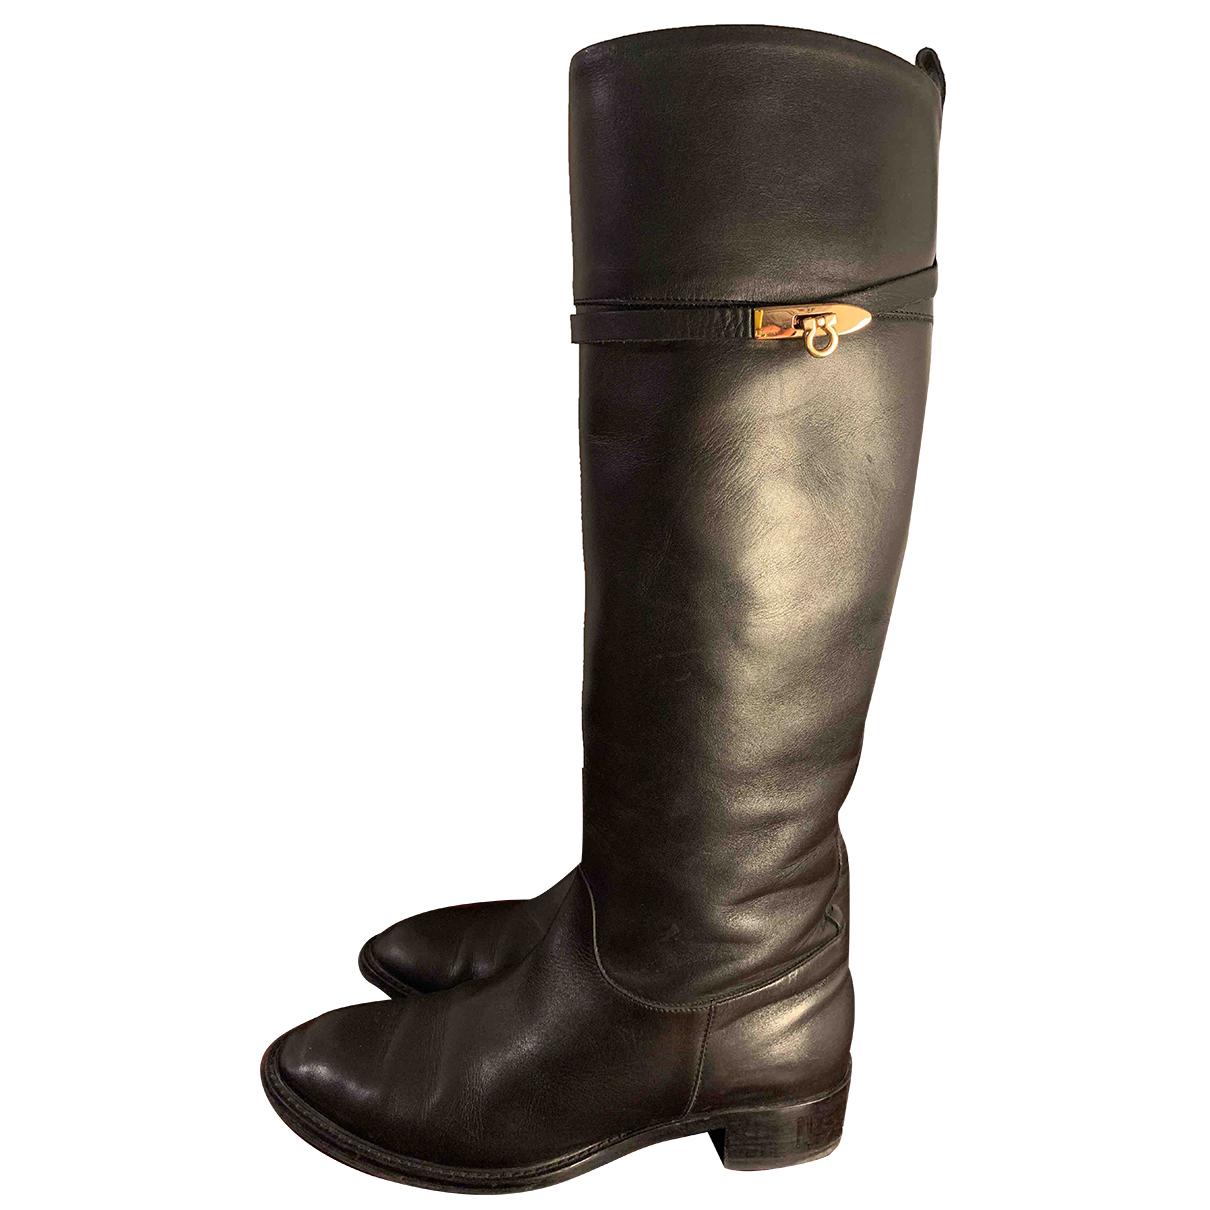 Salvatore Ferragamo N Black Leather Boots for Women 9 US